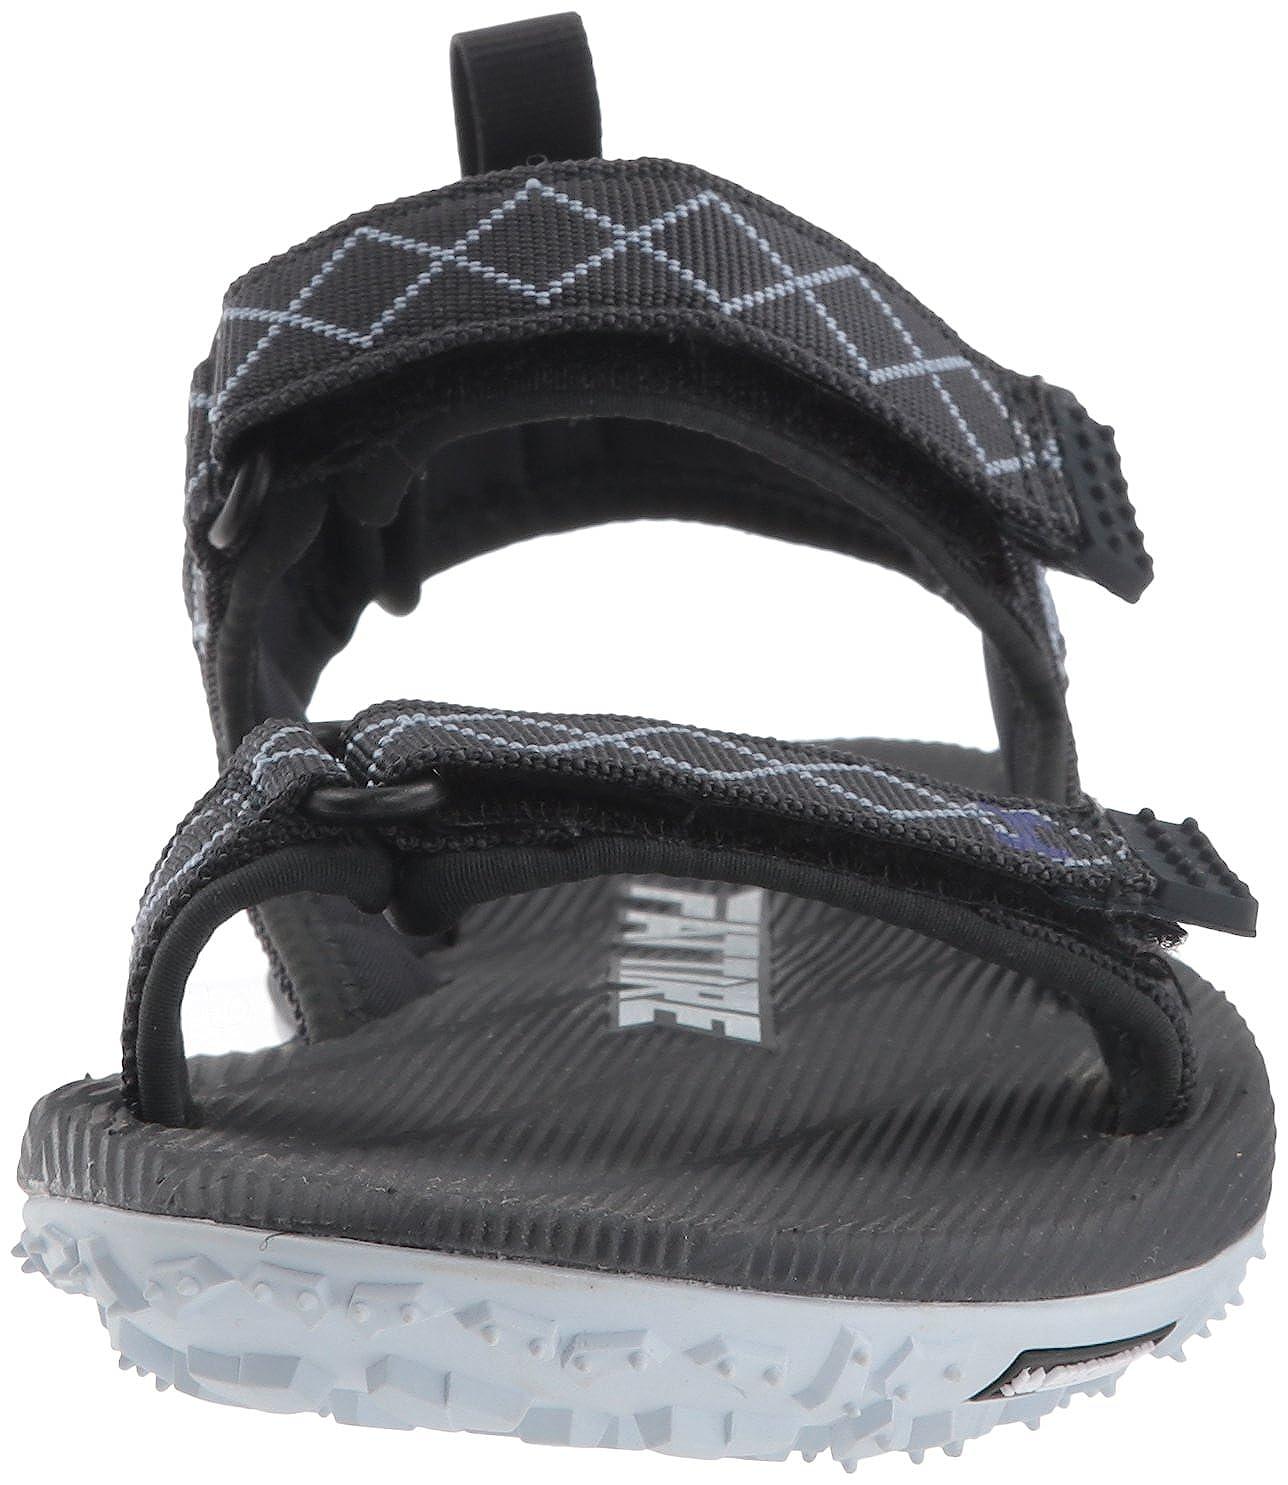 fb08caa89 Under Armour Women s Fat Tire Sandal Hiking Shoes  Amazon.ca  Shoes    Handbags